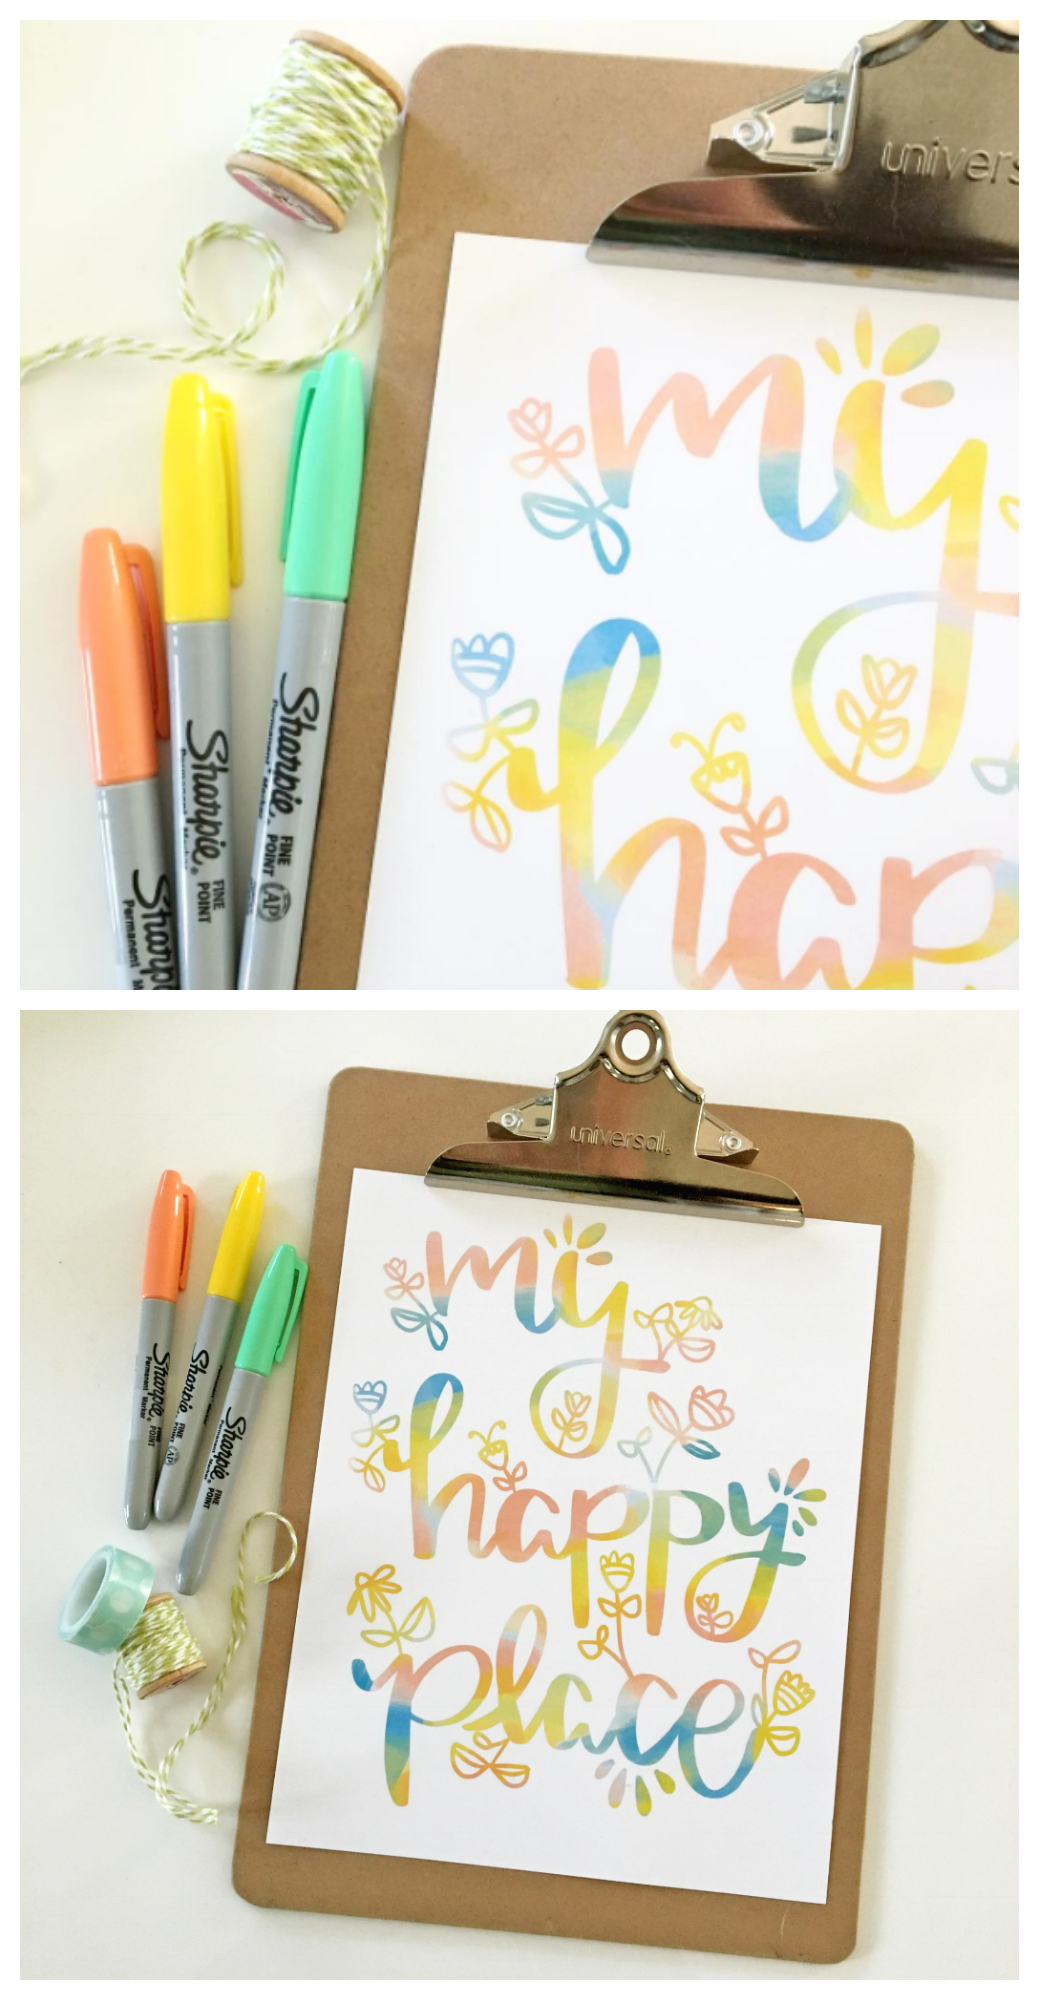 My Happy Place Print | Free Printable Art